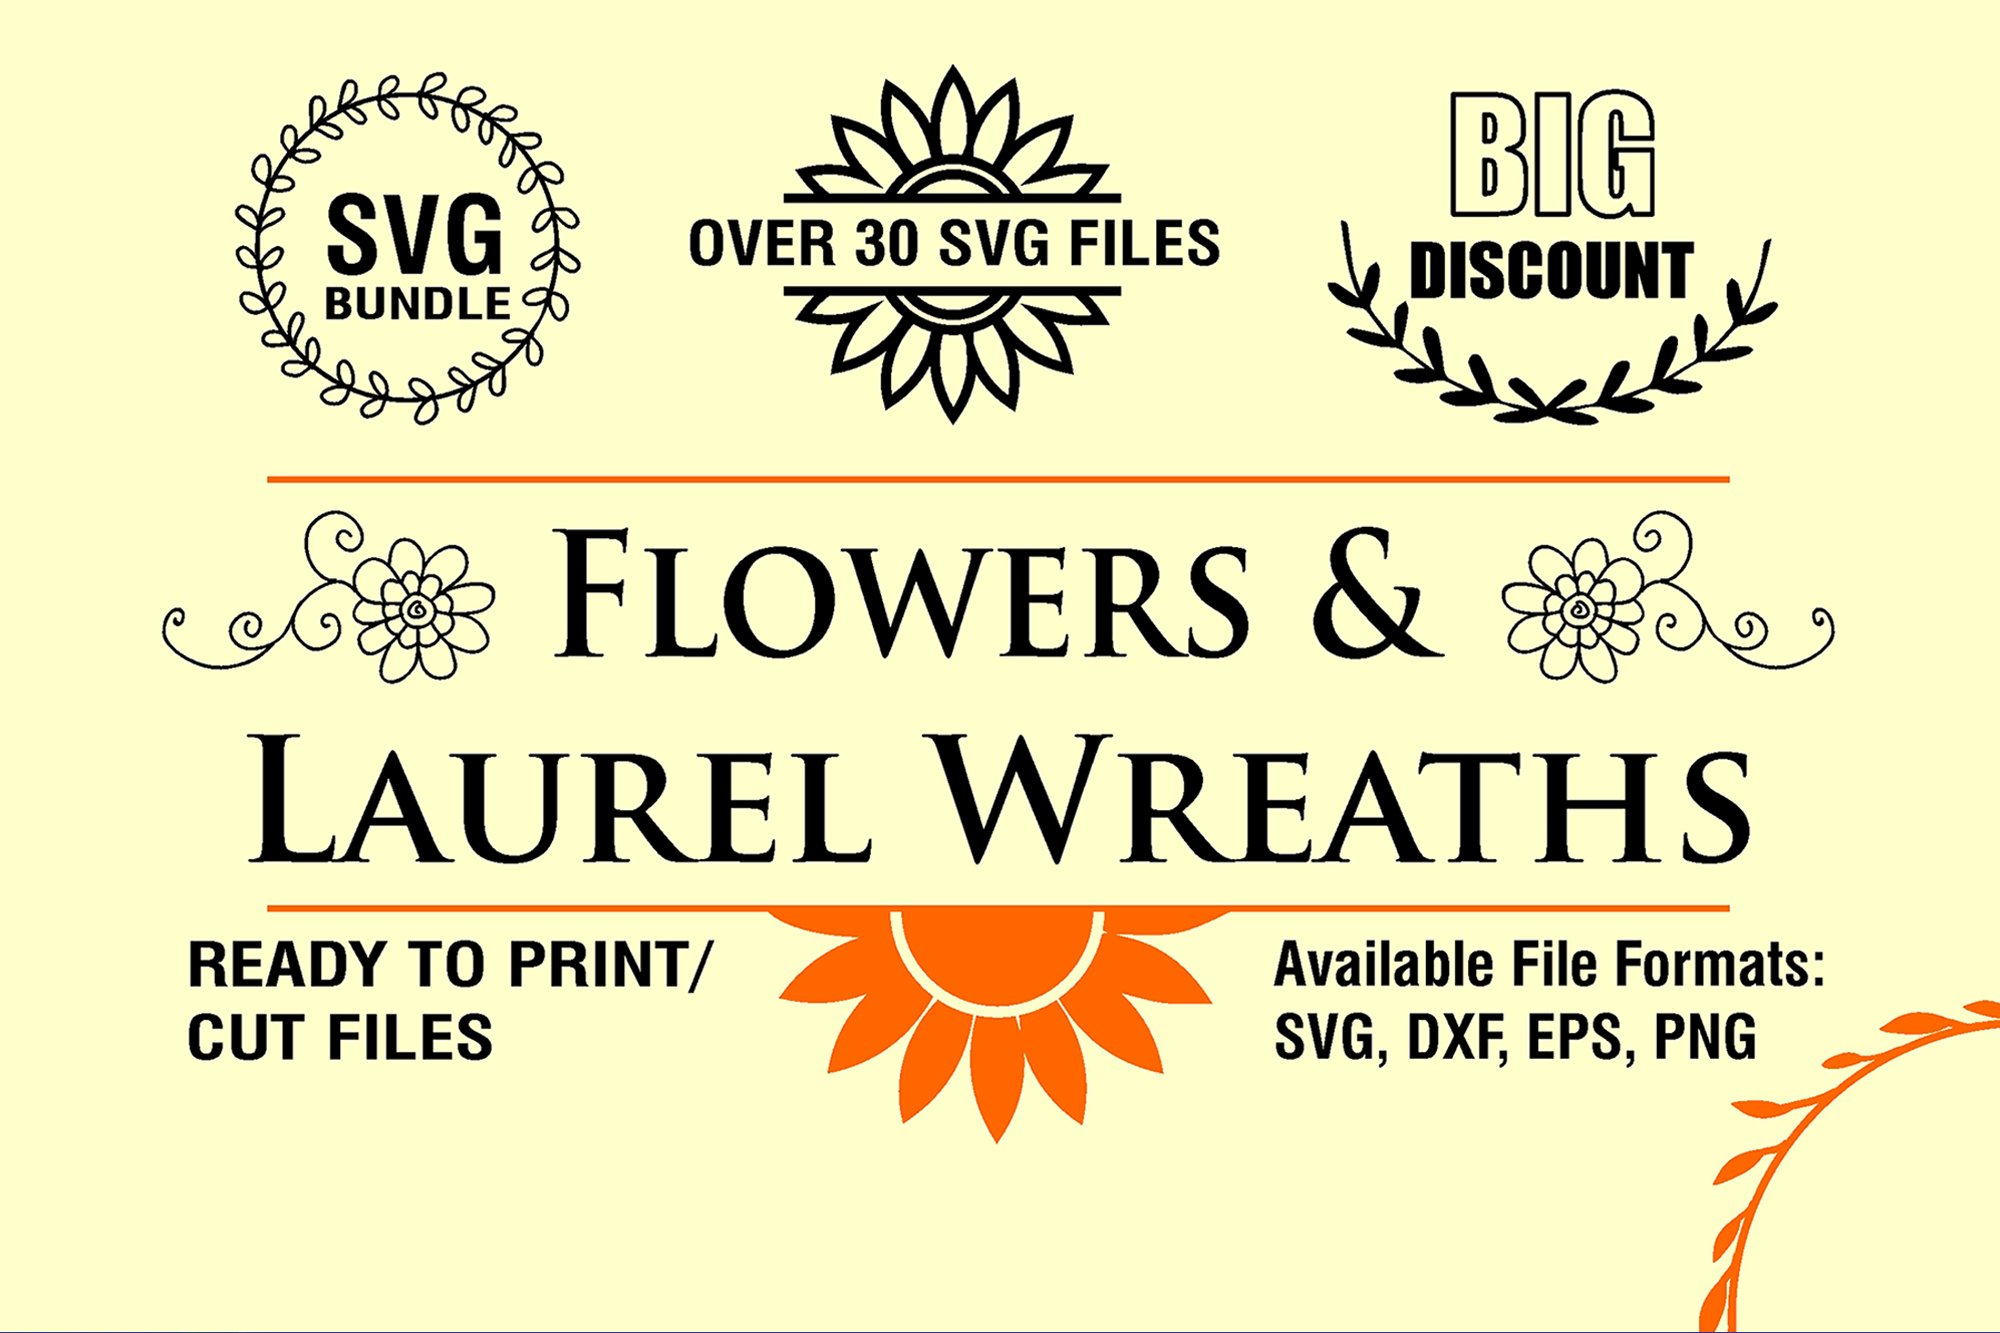 Flowers and Laurel Wreaths SVG Bundle example image 2